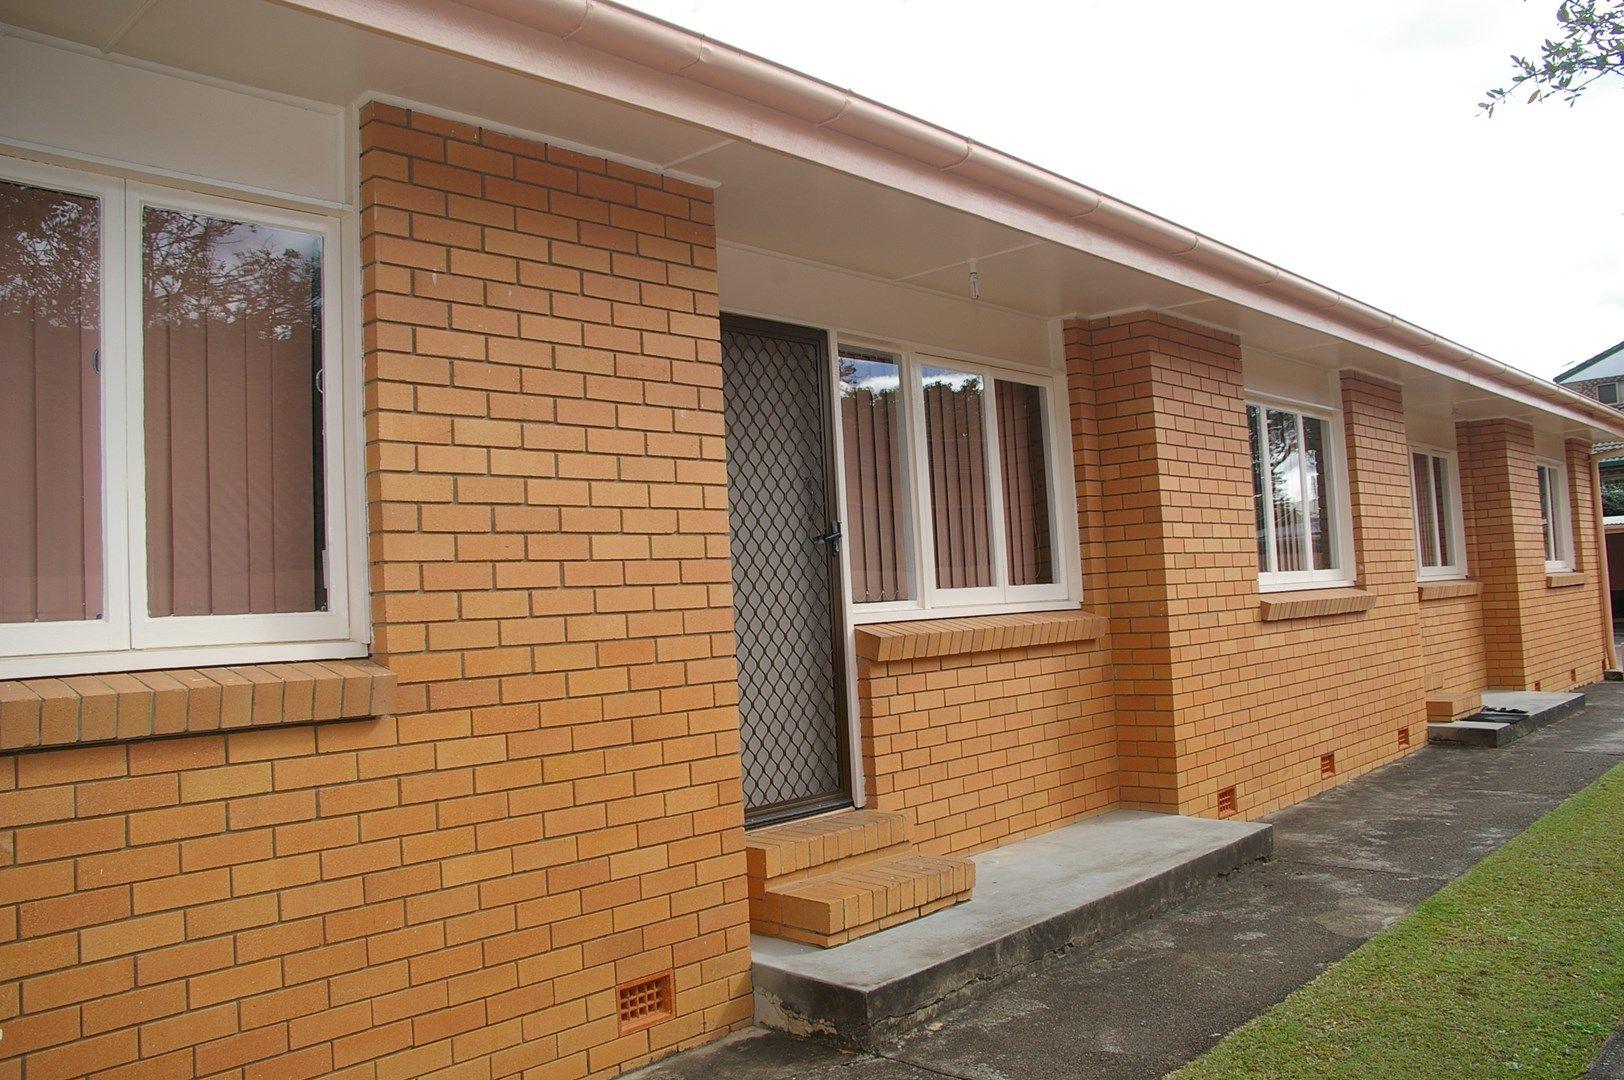 3/12 Arnold Street, Holland Park QLD 4121, Image 0